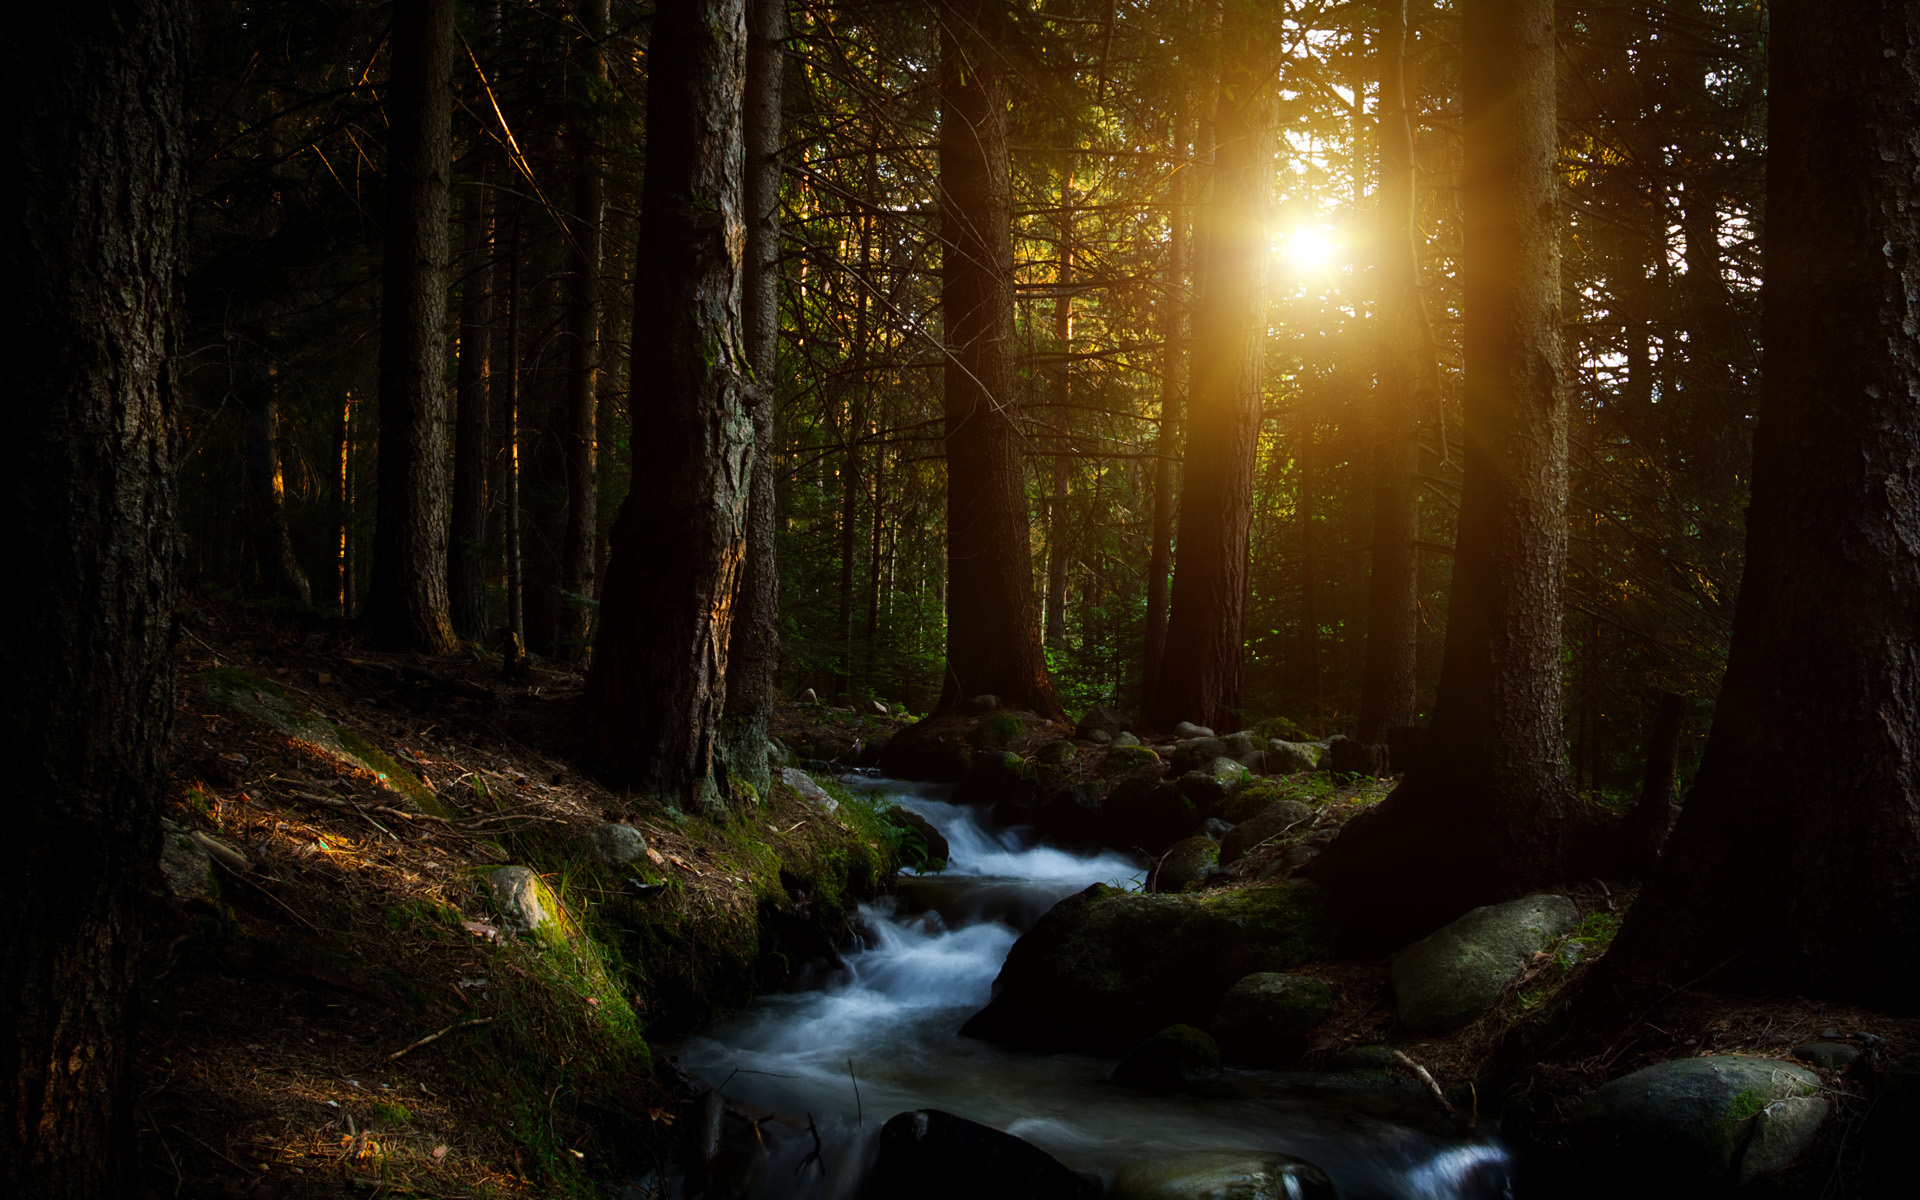 Widescreen S - Beautiful Dark Forest Background Hd - HD Wallpaper